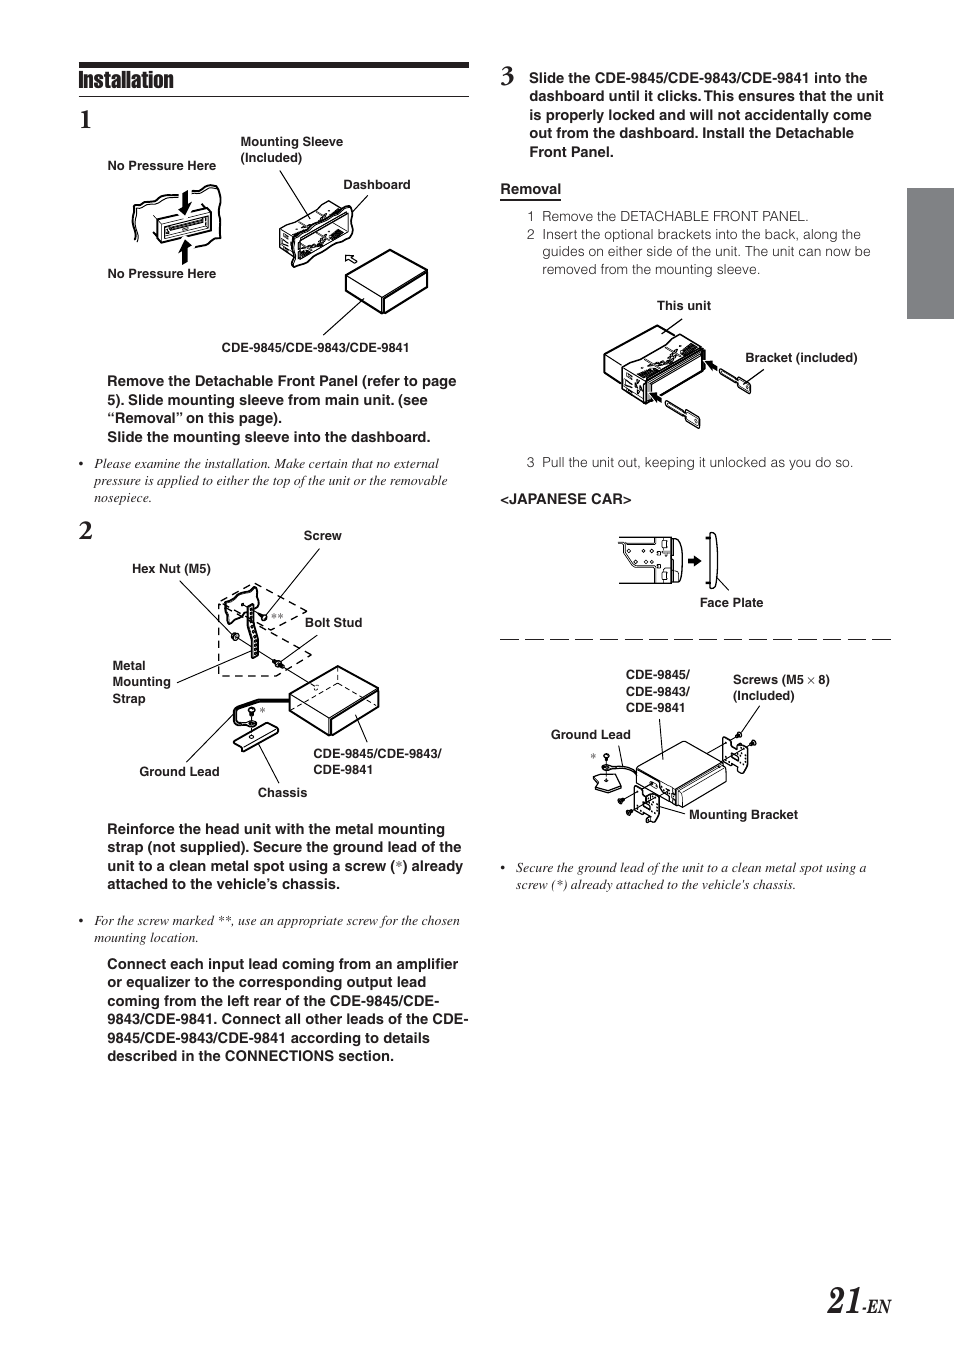 installation alpine cde 9843 user manual page 22 72 rh manualsdir com alpine cde 9843 service manual Alpine CDE 9843 Specs